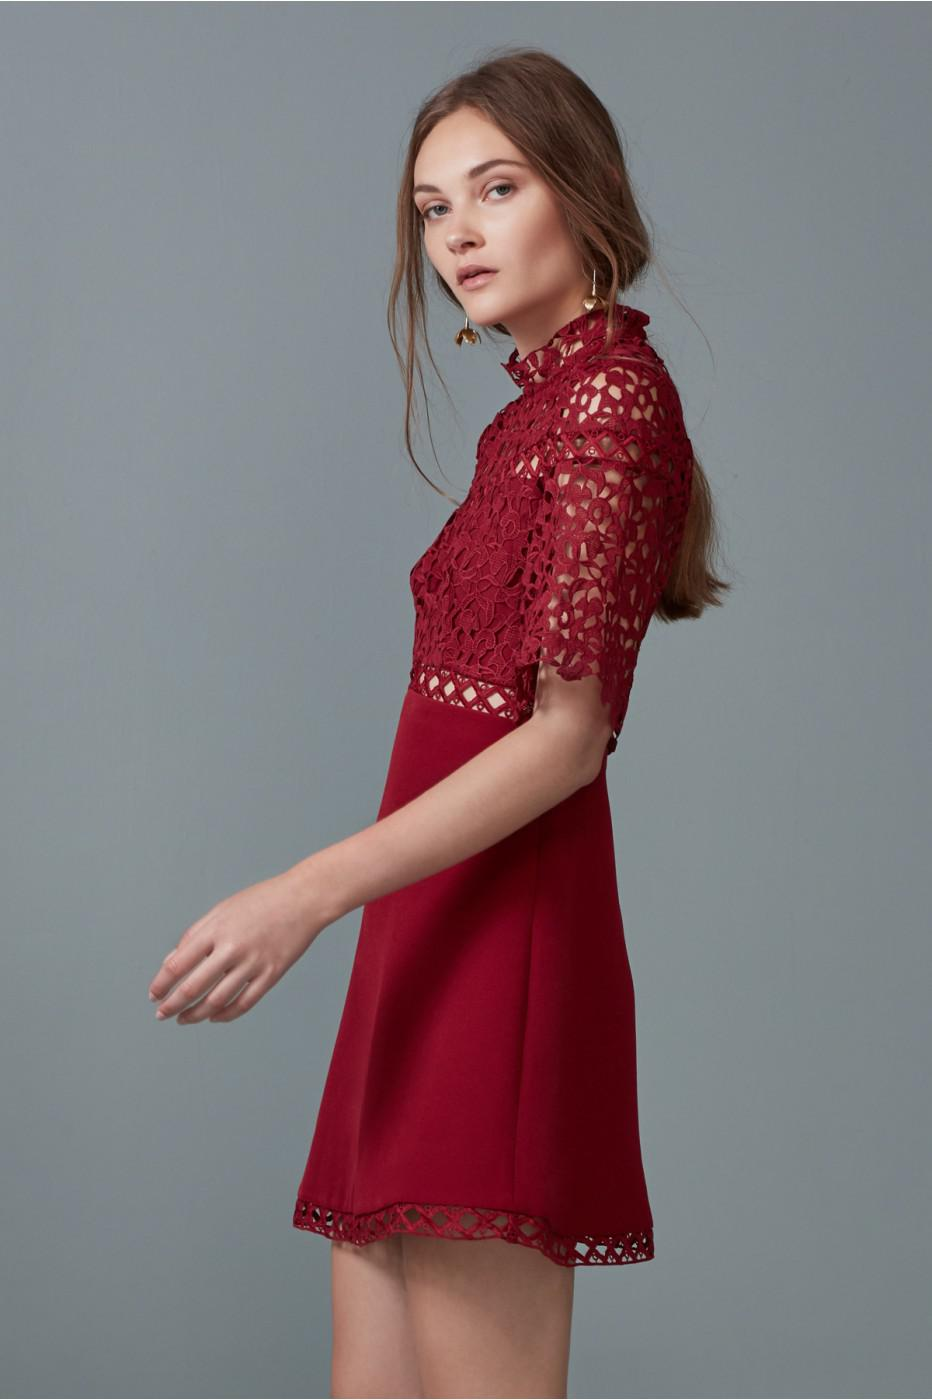 bb63766dc386 Lyst - Keepsake Uplifted Mini Dress in Red